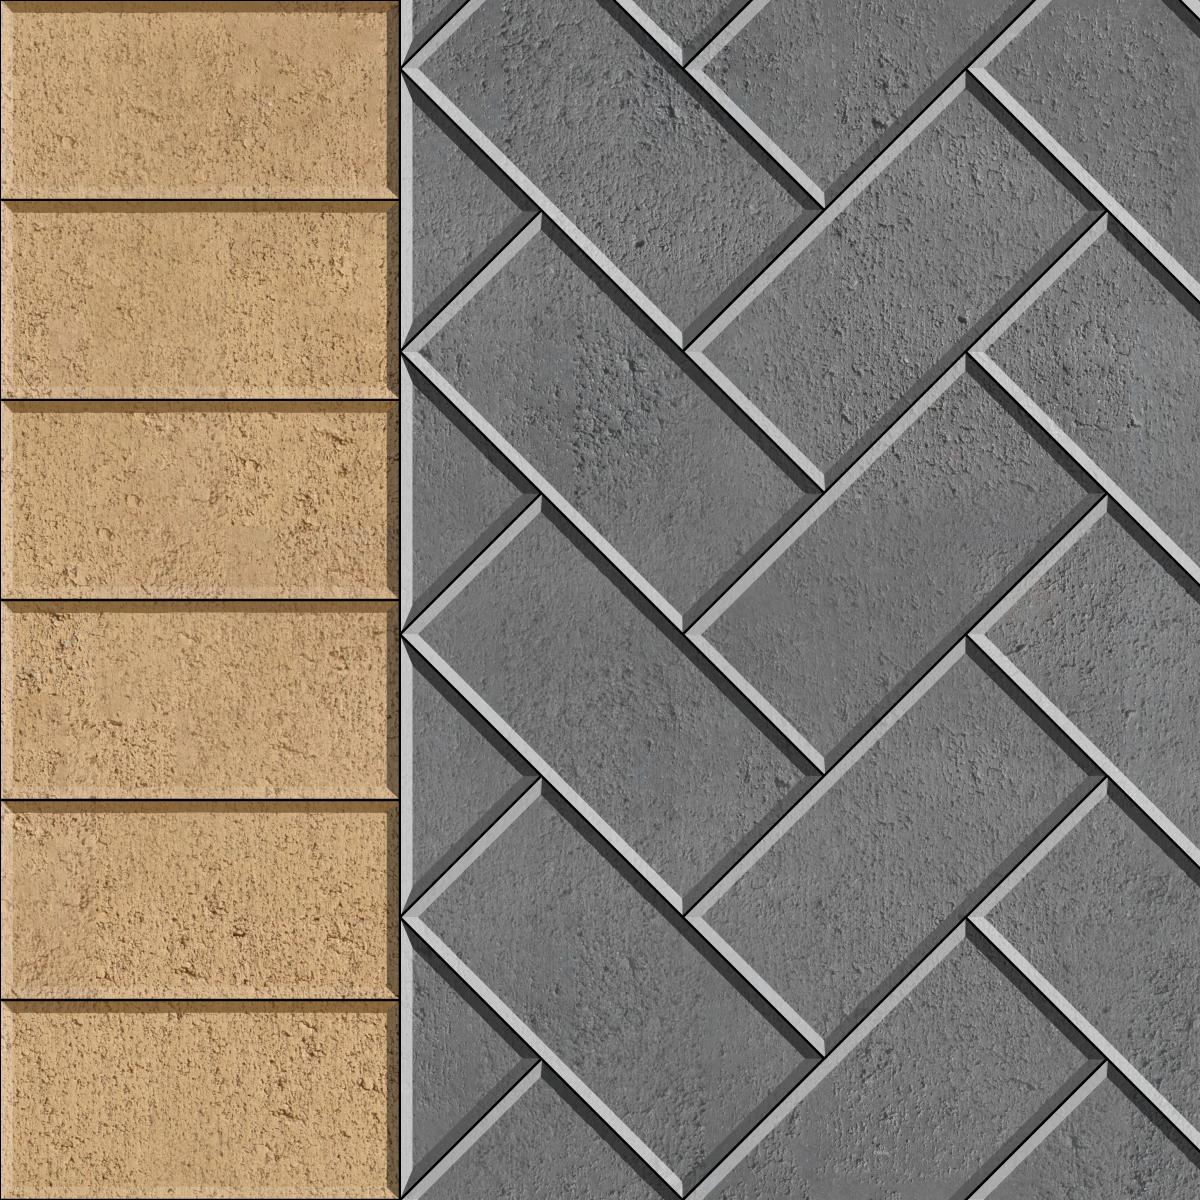 45 Herringbone with header course brick paver